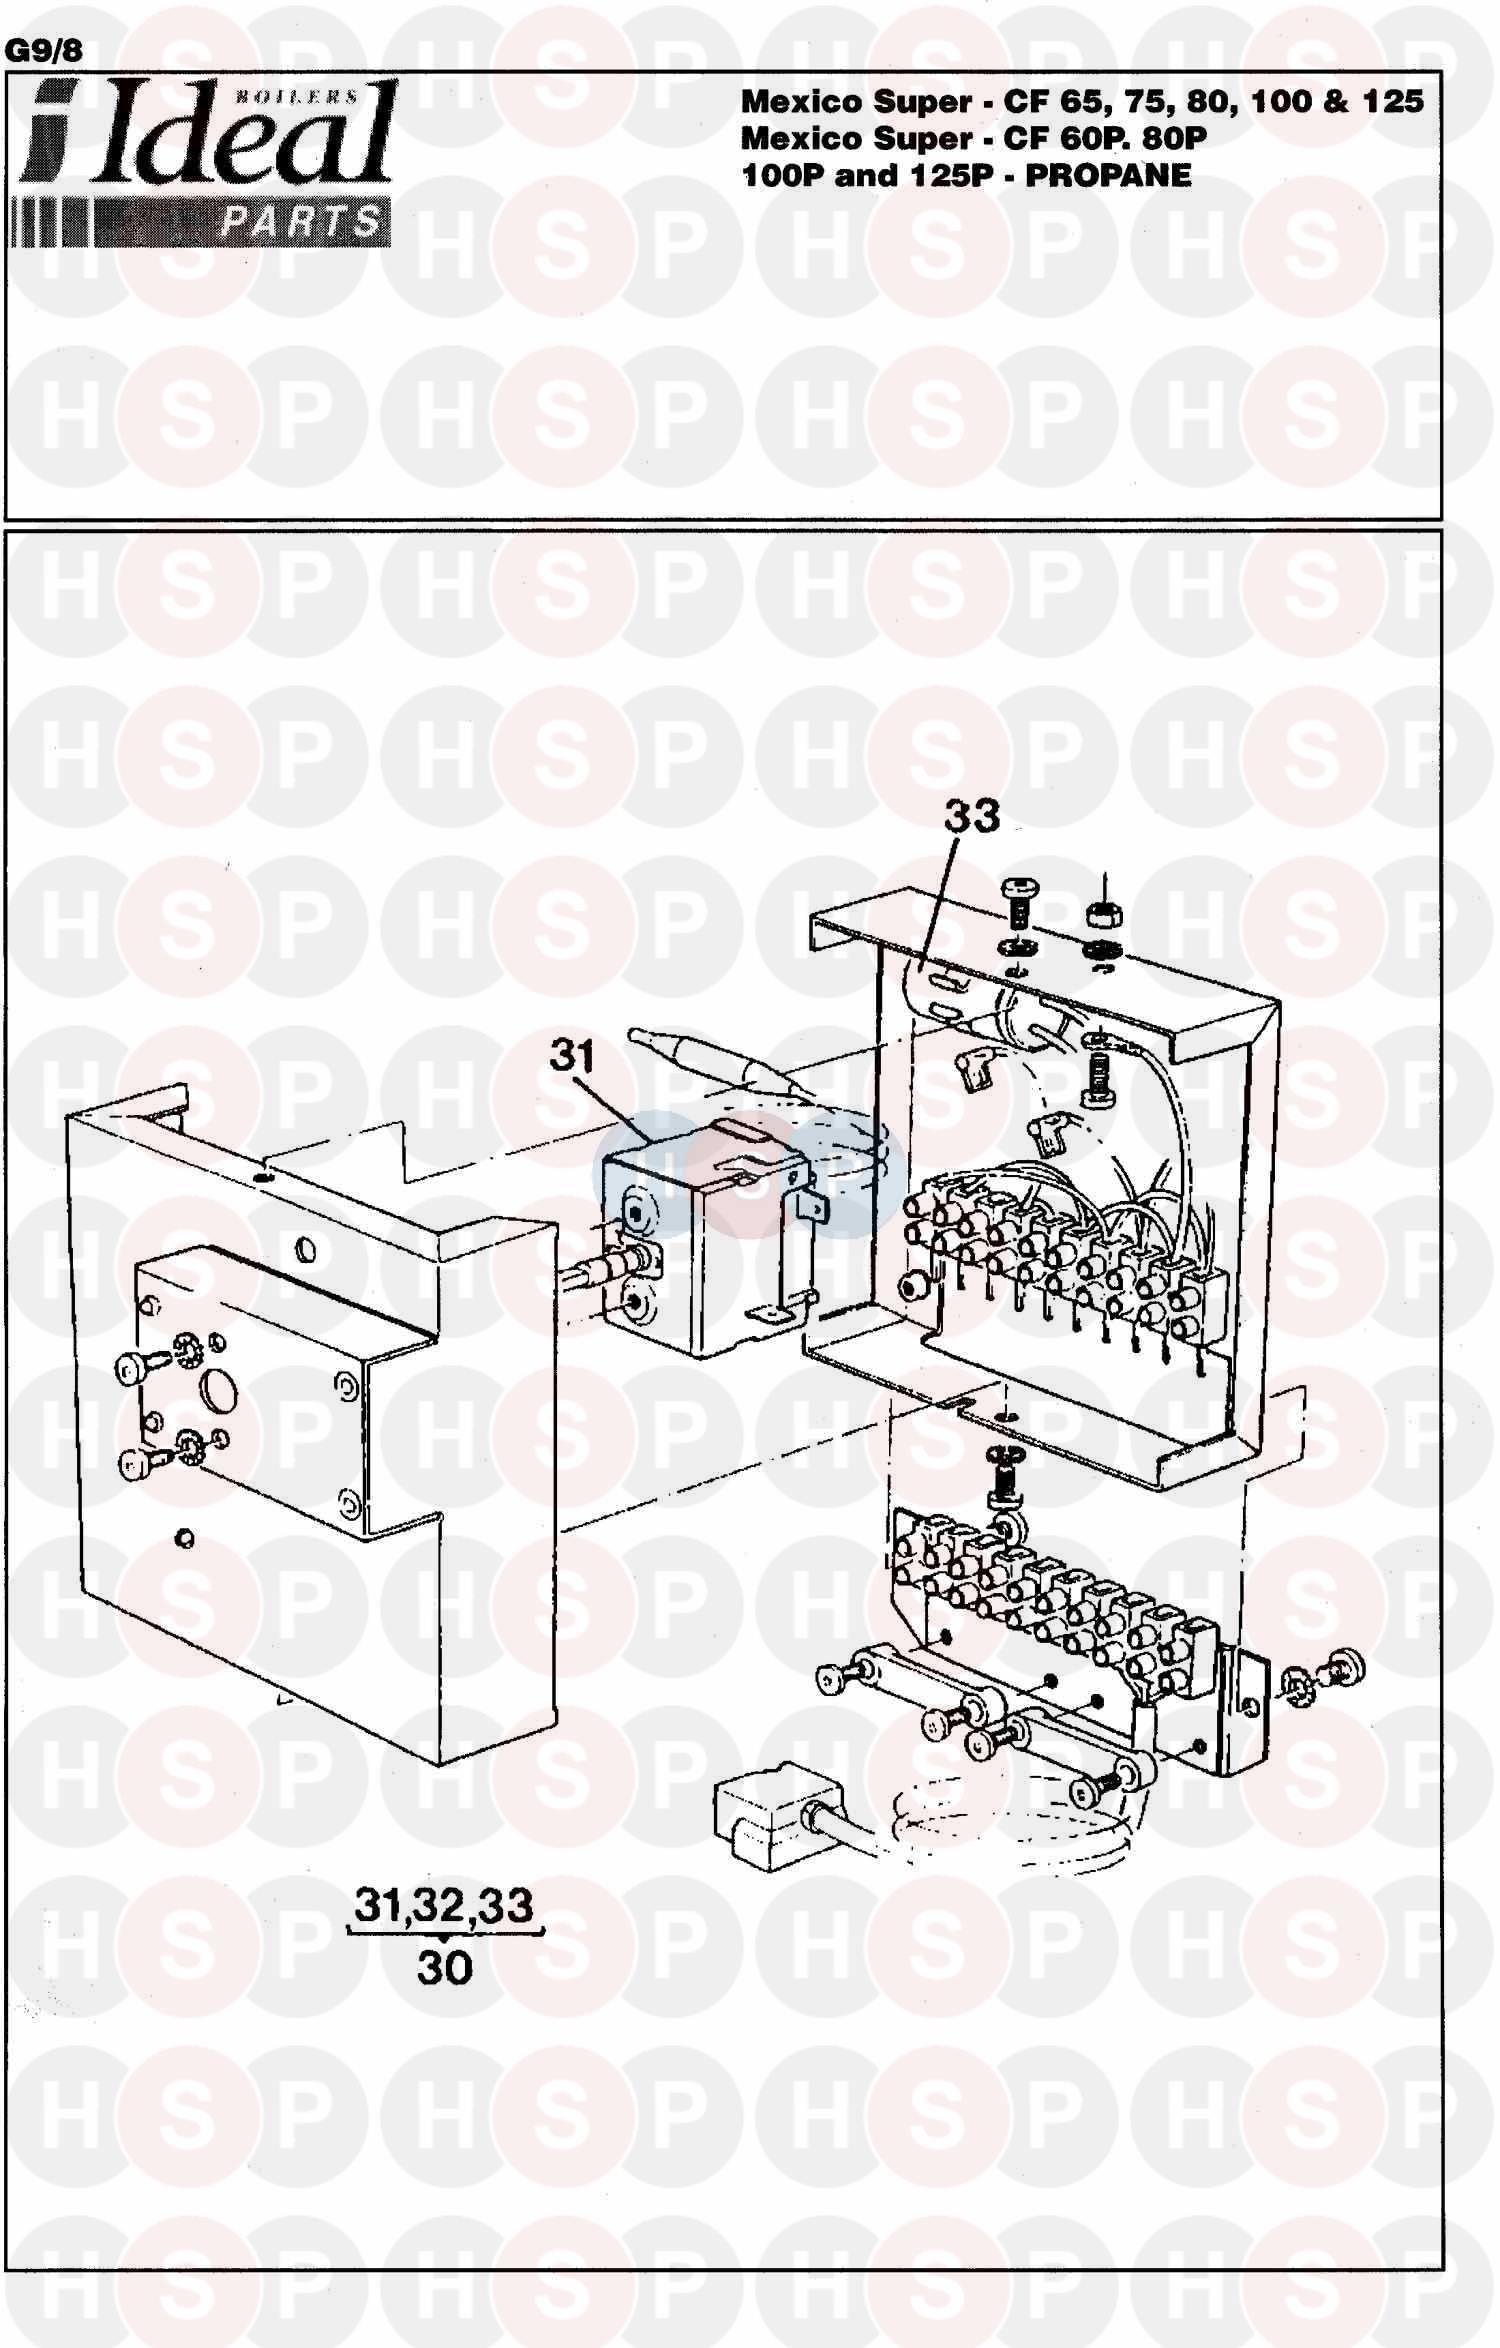 Ideal MEXICO SUPER CF 65 Appliance Diagram (Control Box